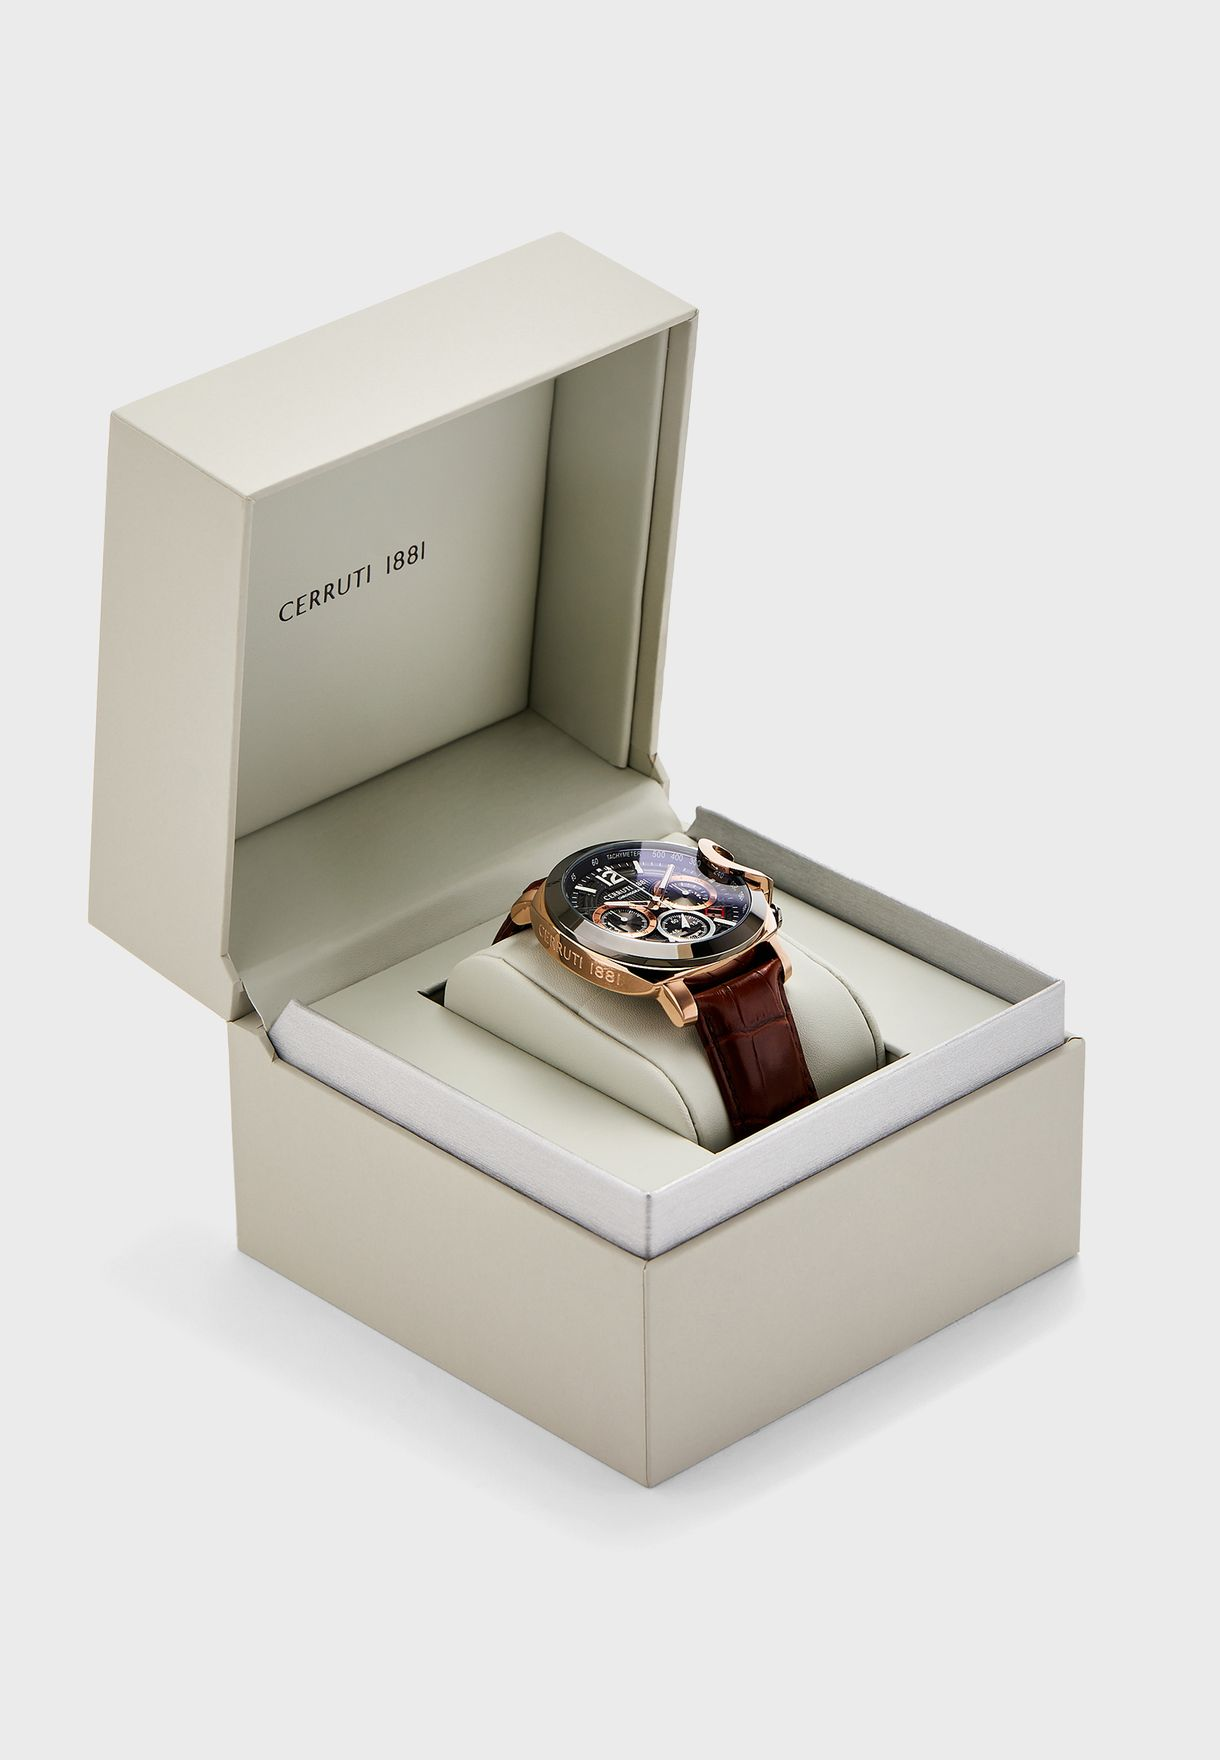 C CRWA27103 Mezzano Chronograph Watch